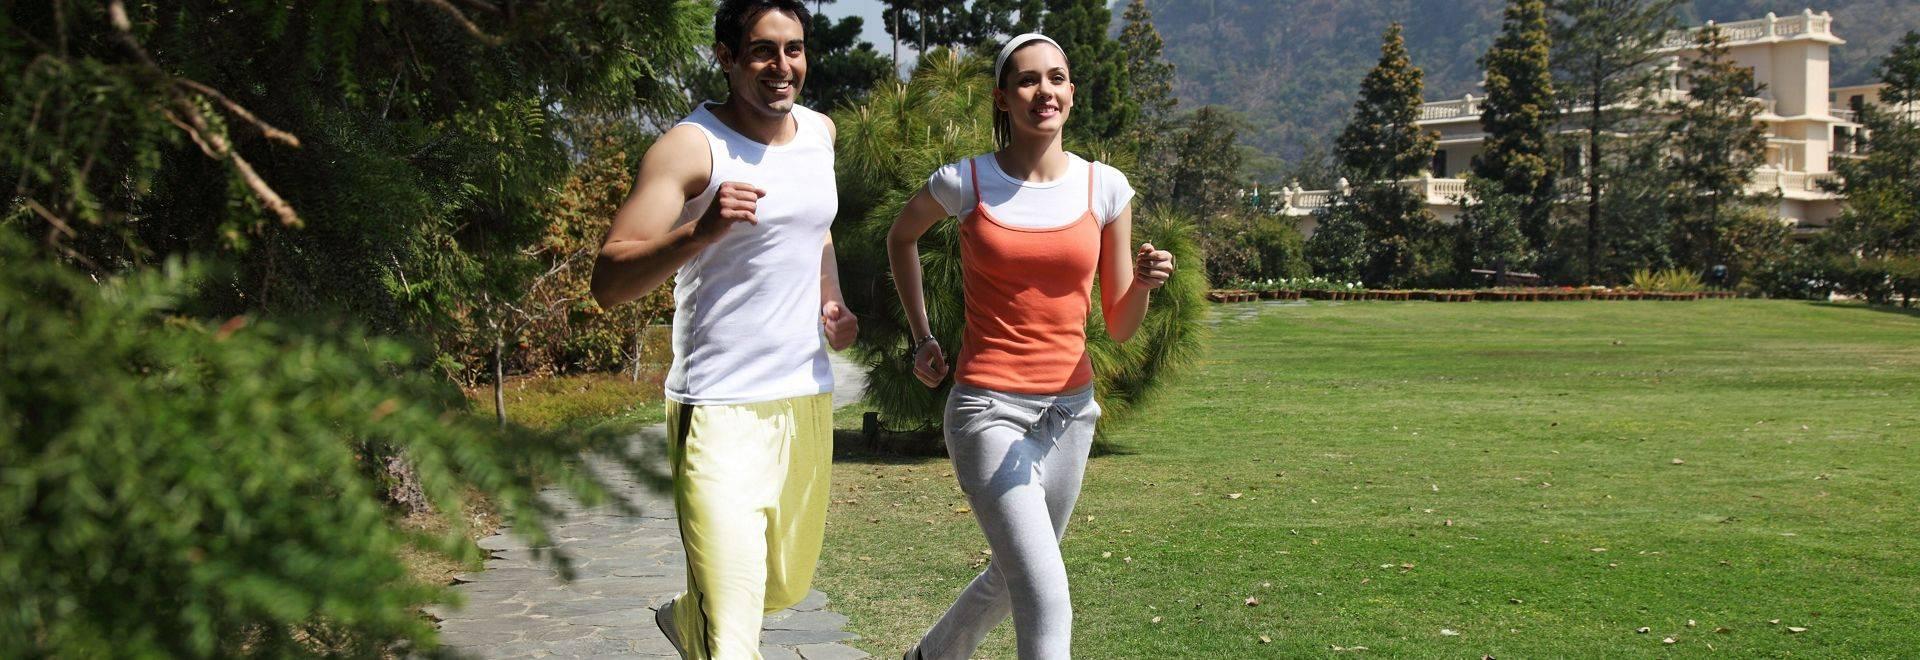 Ananda-jogging.jpg